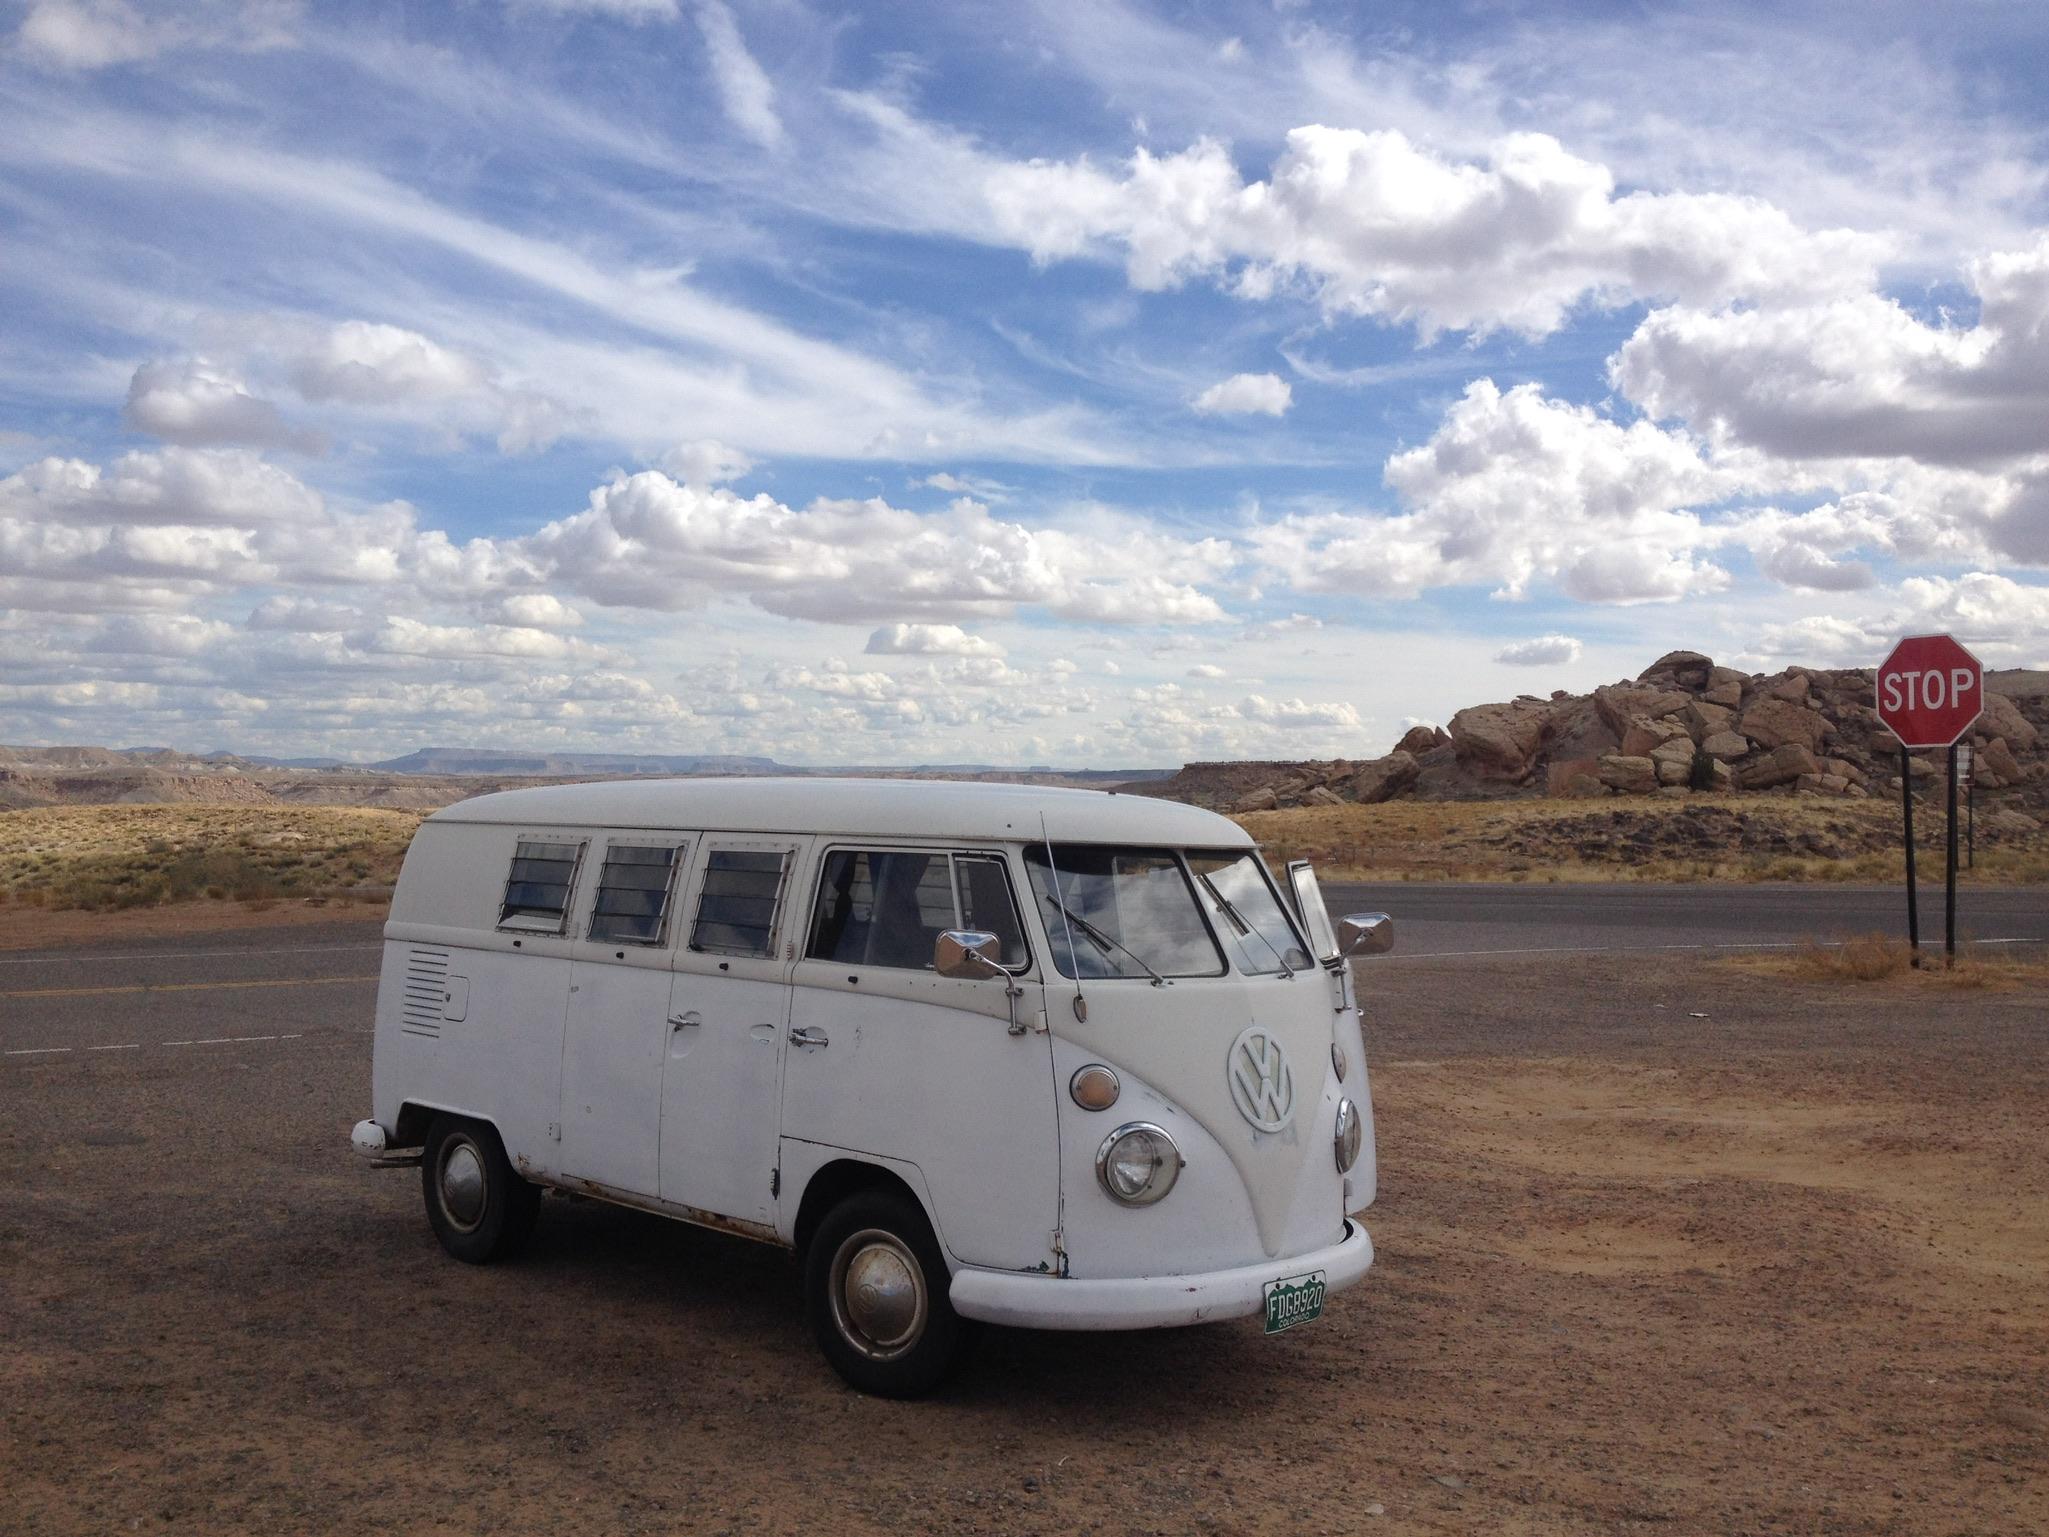 Rita stopped at Four Corners - where Arizona, Colorado, New Mexico, and Utah meet.